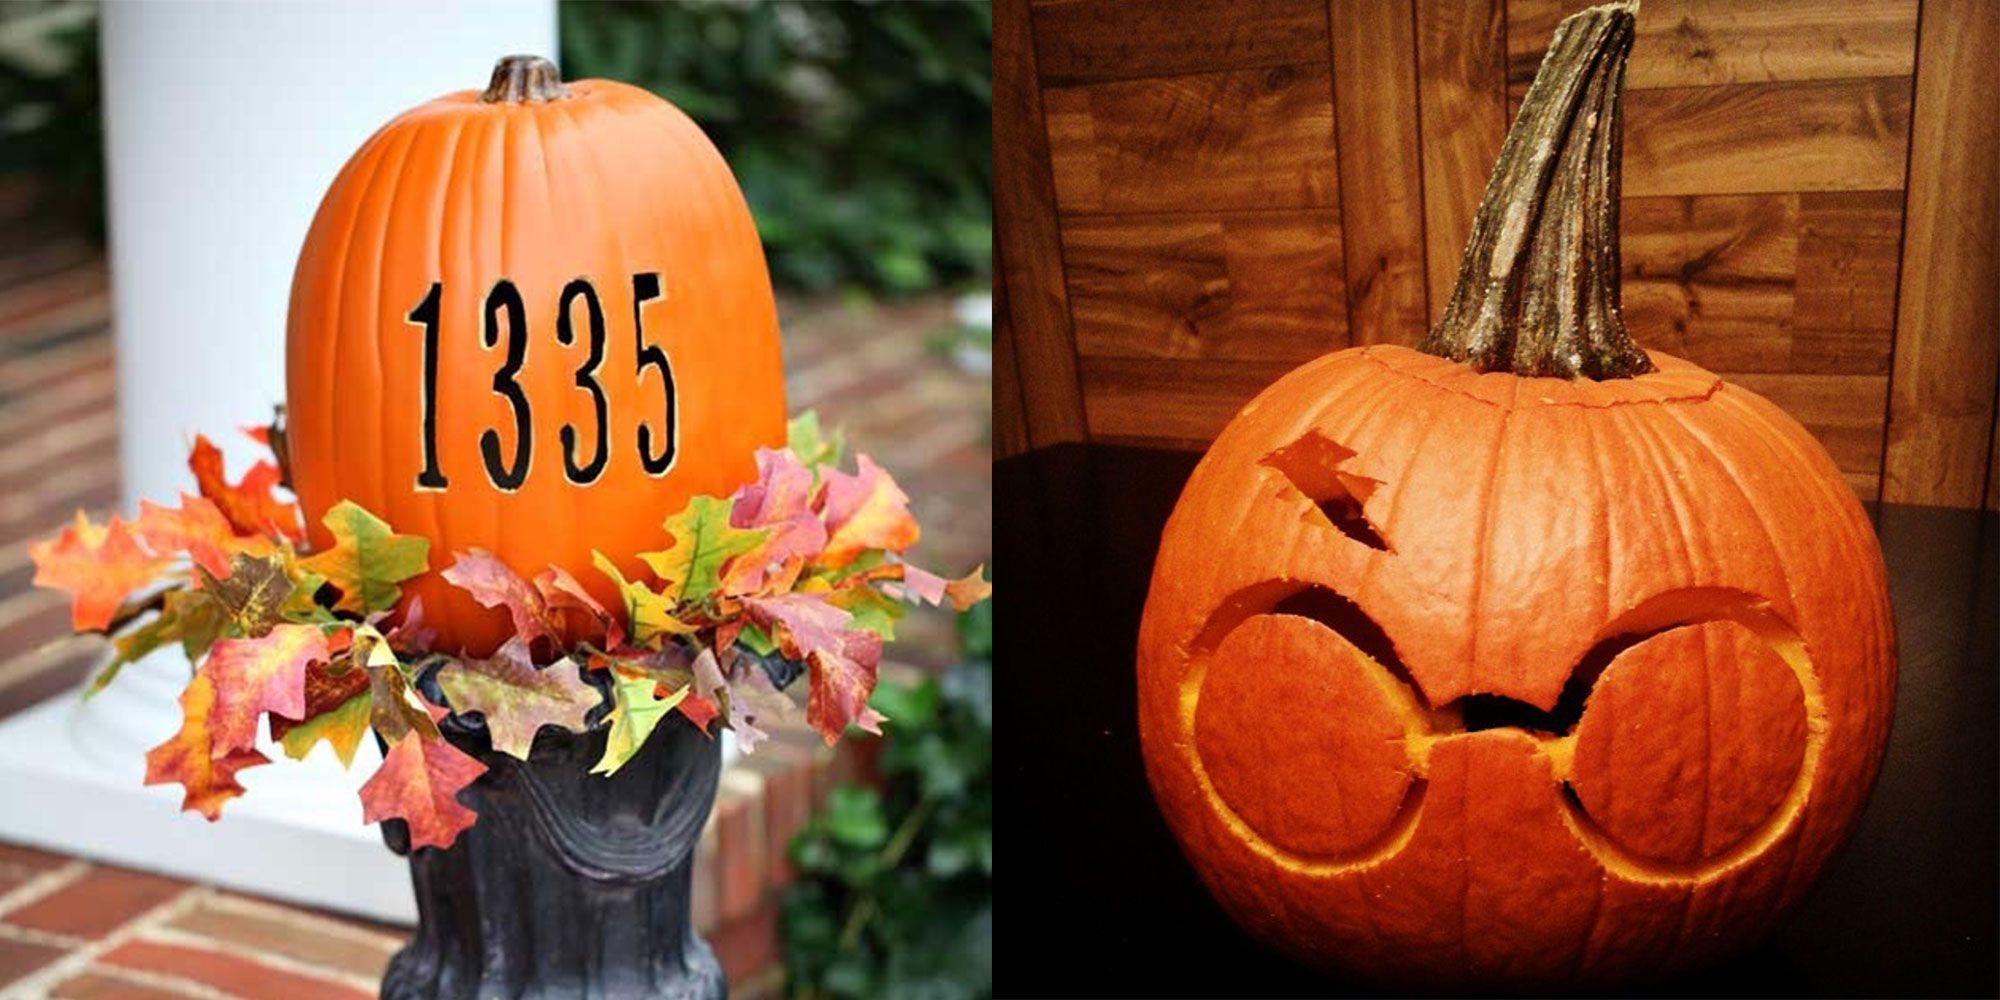 30 creative halloween pumpkin carving ideas awesome jack o rh delish com cool pumpkin carving ideas easy cool pumpkin carving ideas step by step